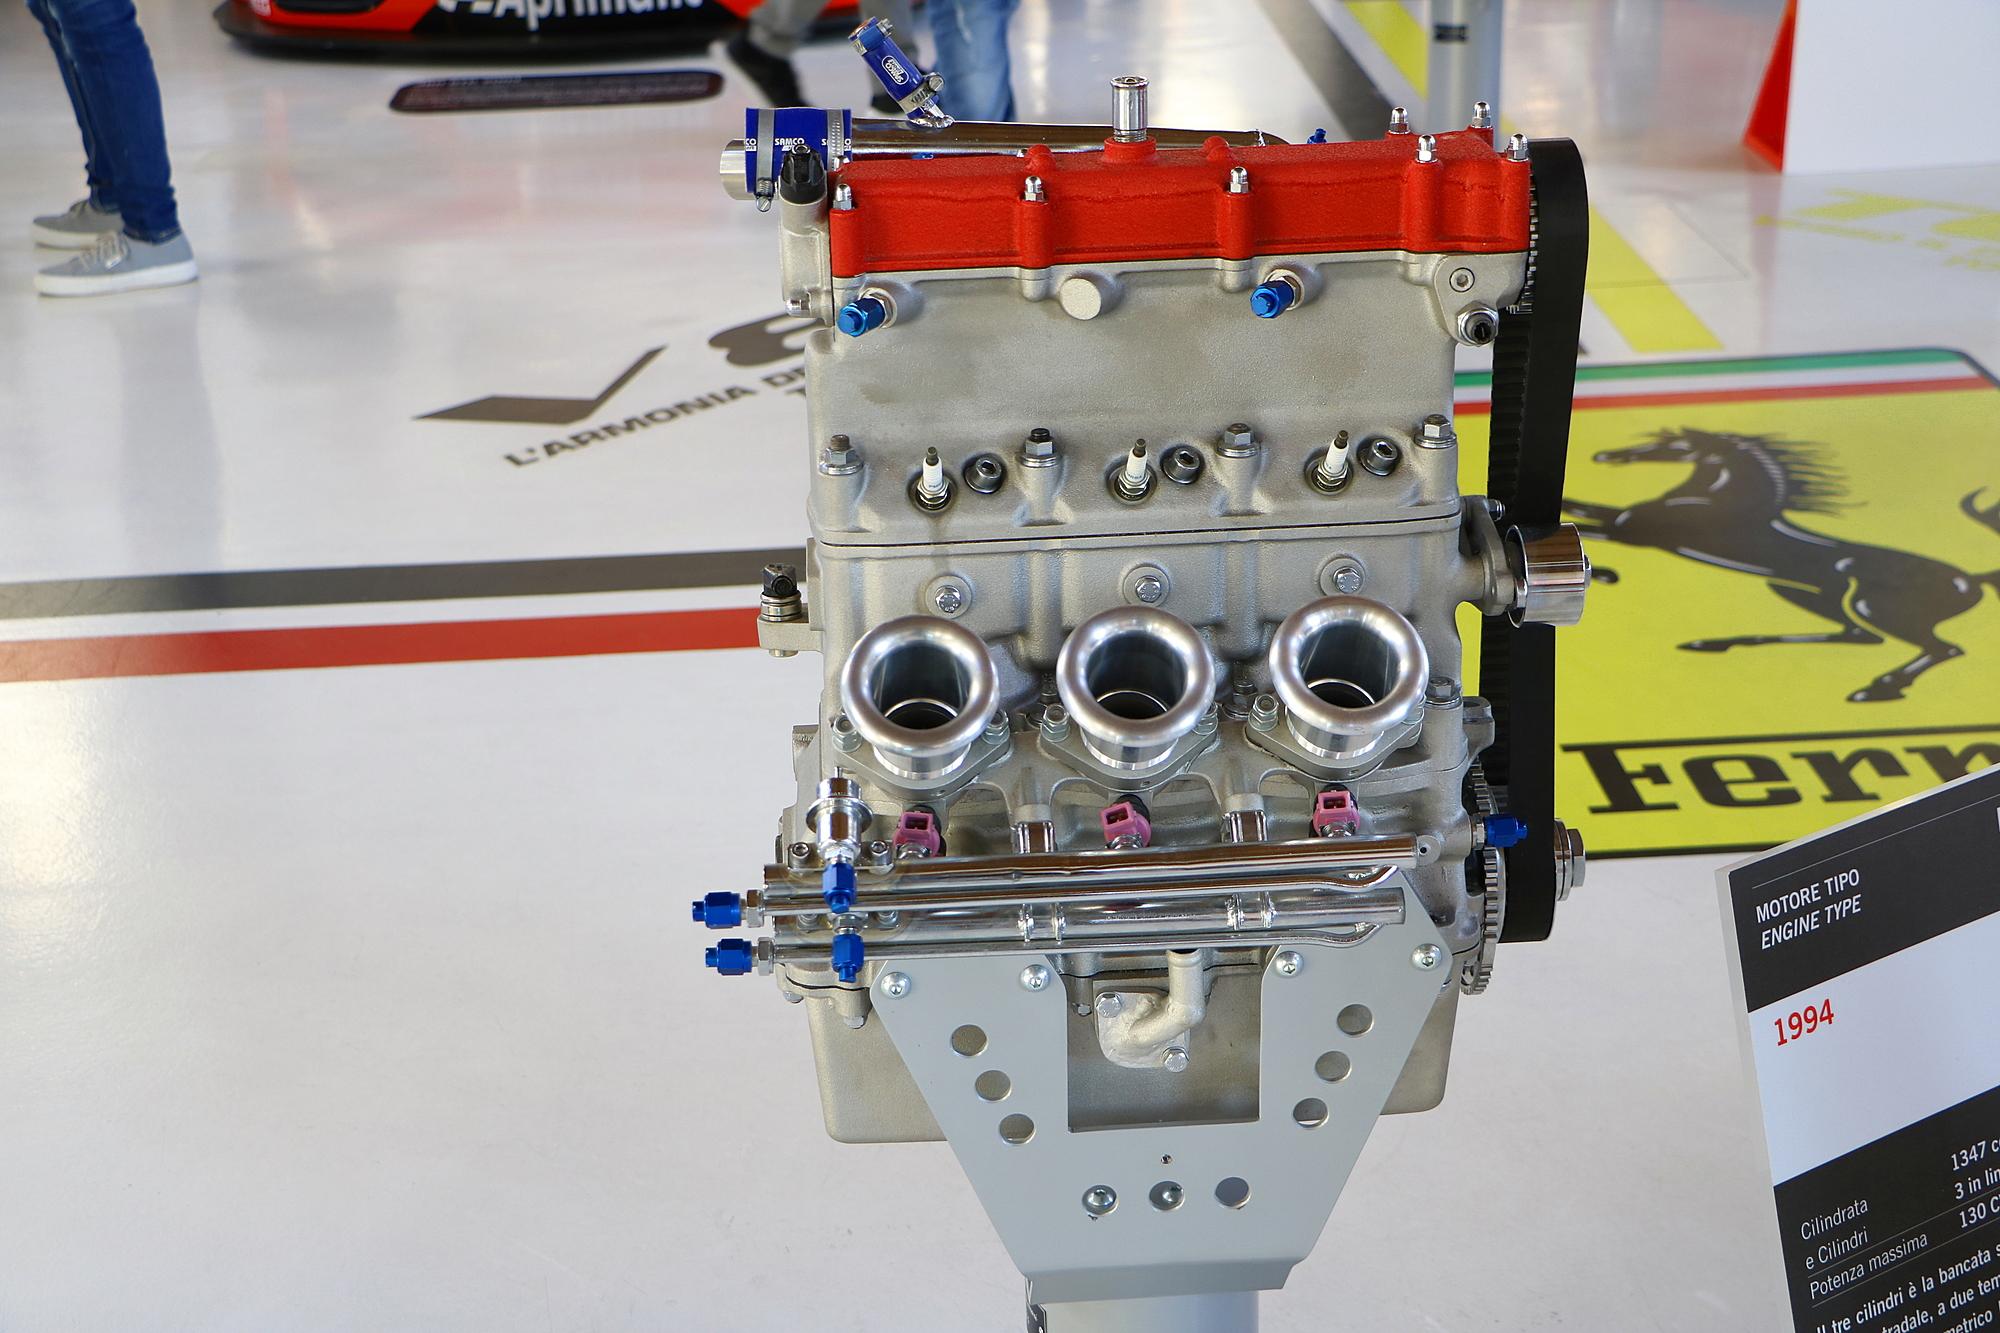 Ferrari F134 – Motor 3 cilindros